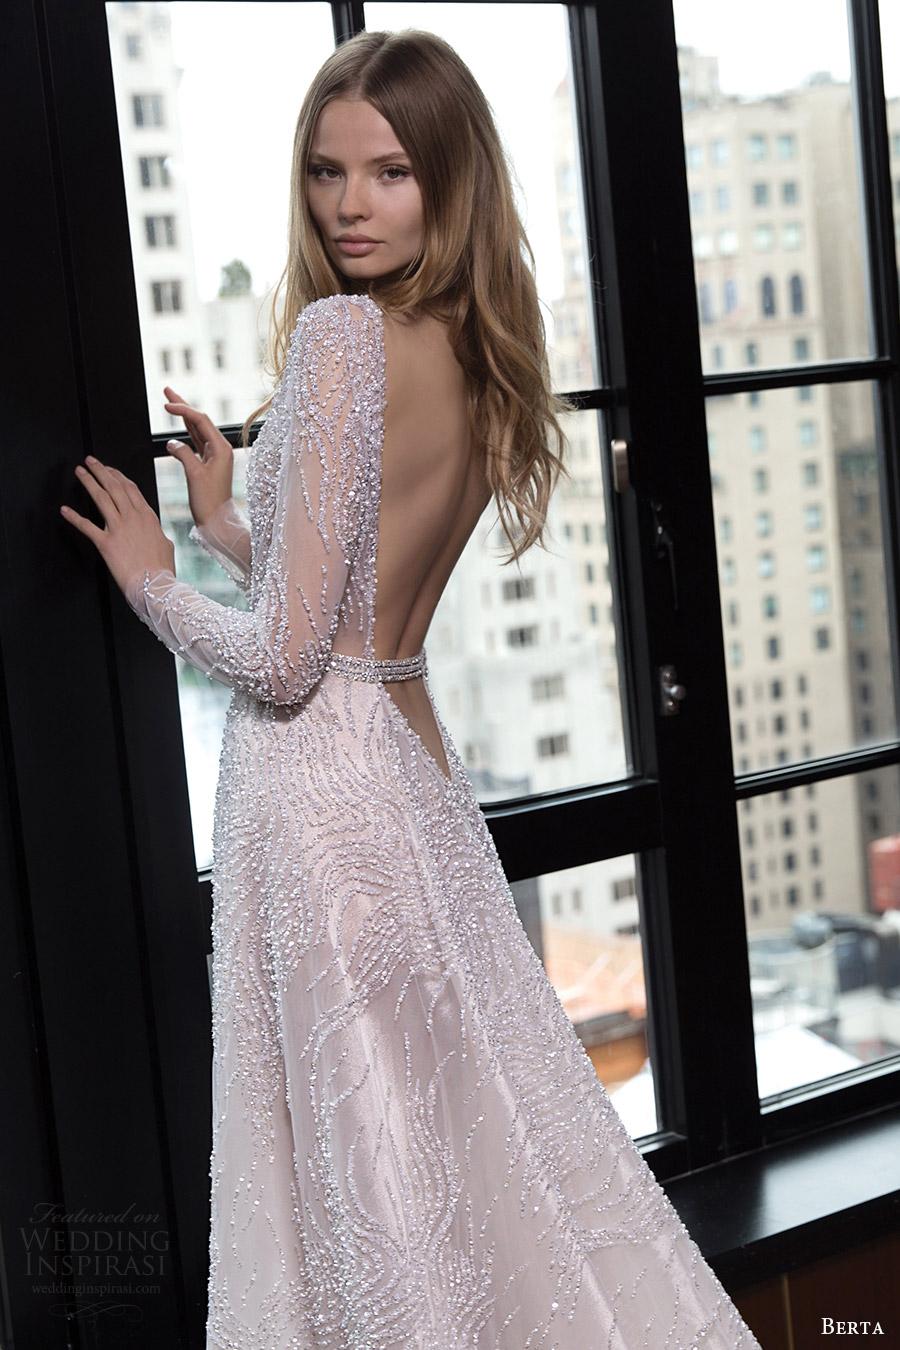 berta bridal fall 2016 long sleeves jewel neck beaded aline wedding dress (16 122) zbv low vback